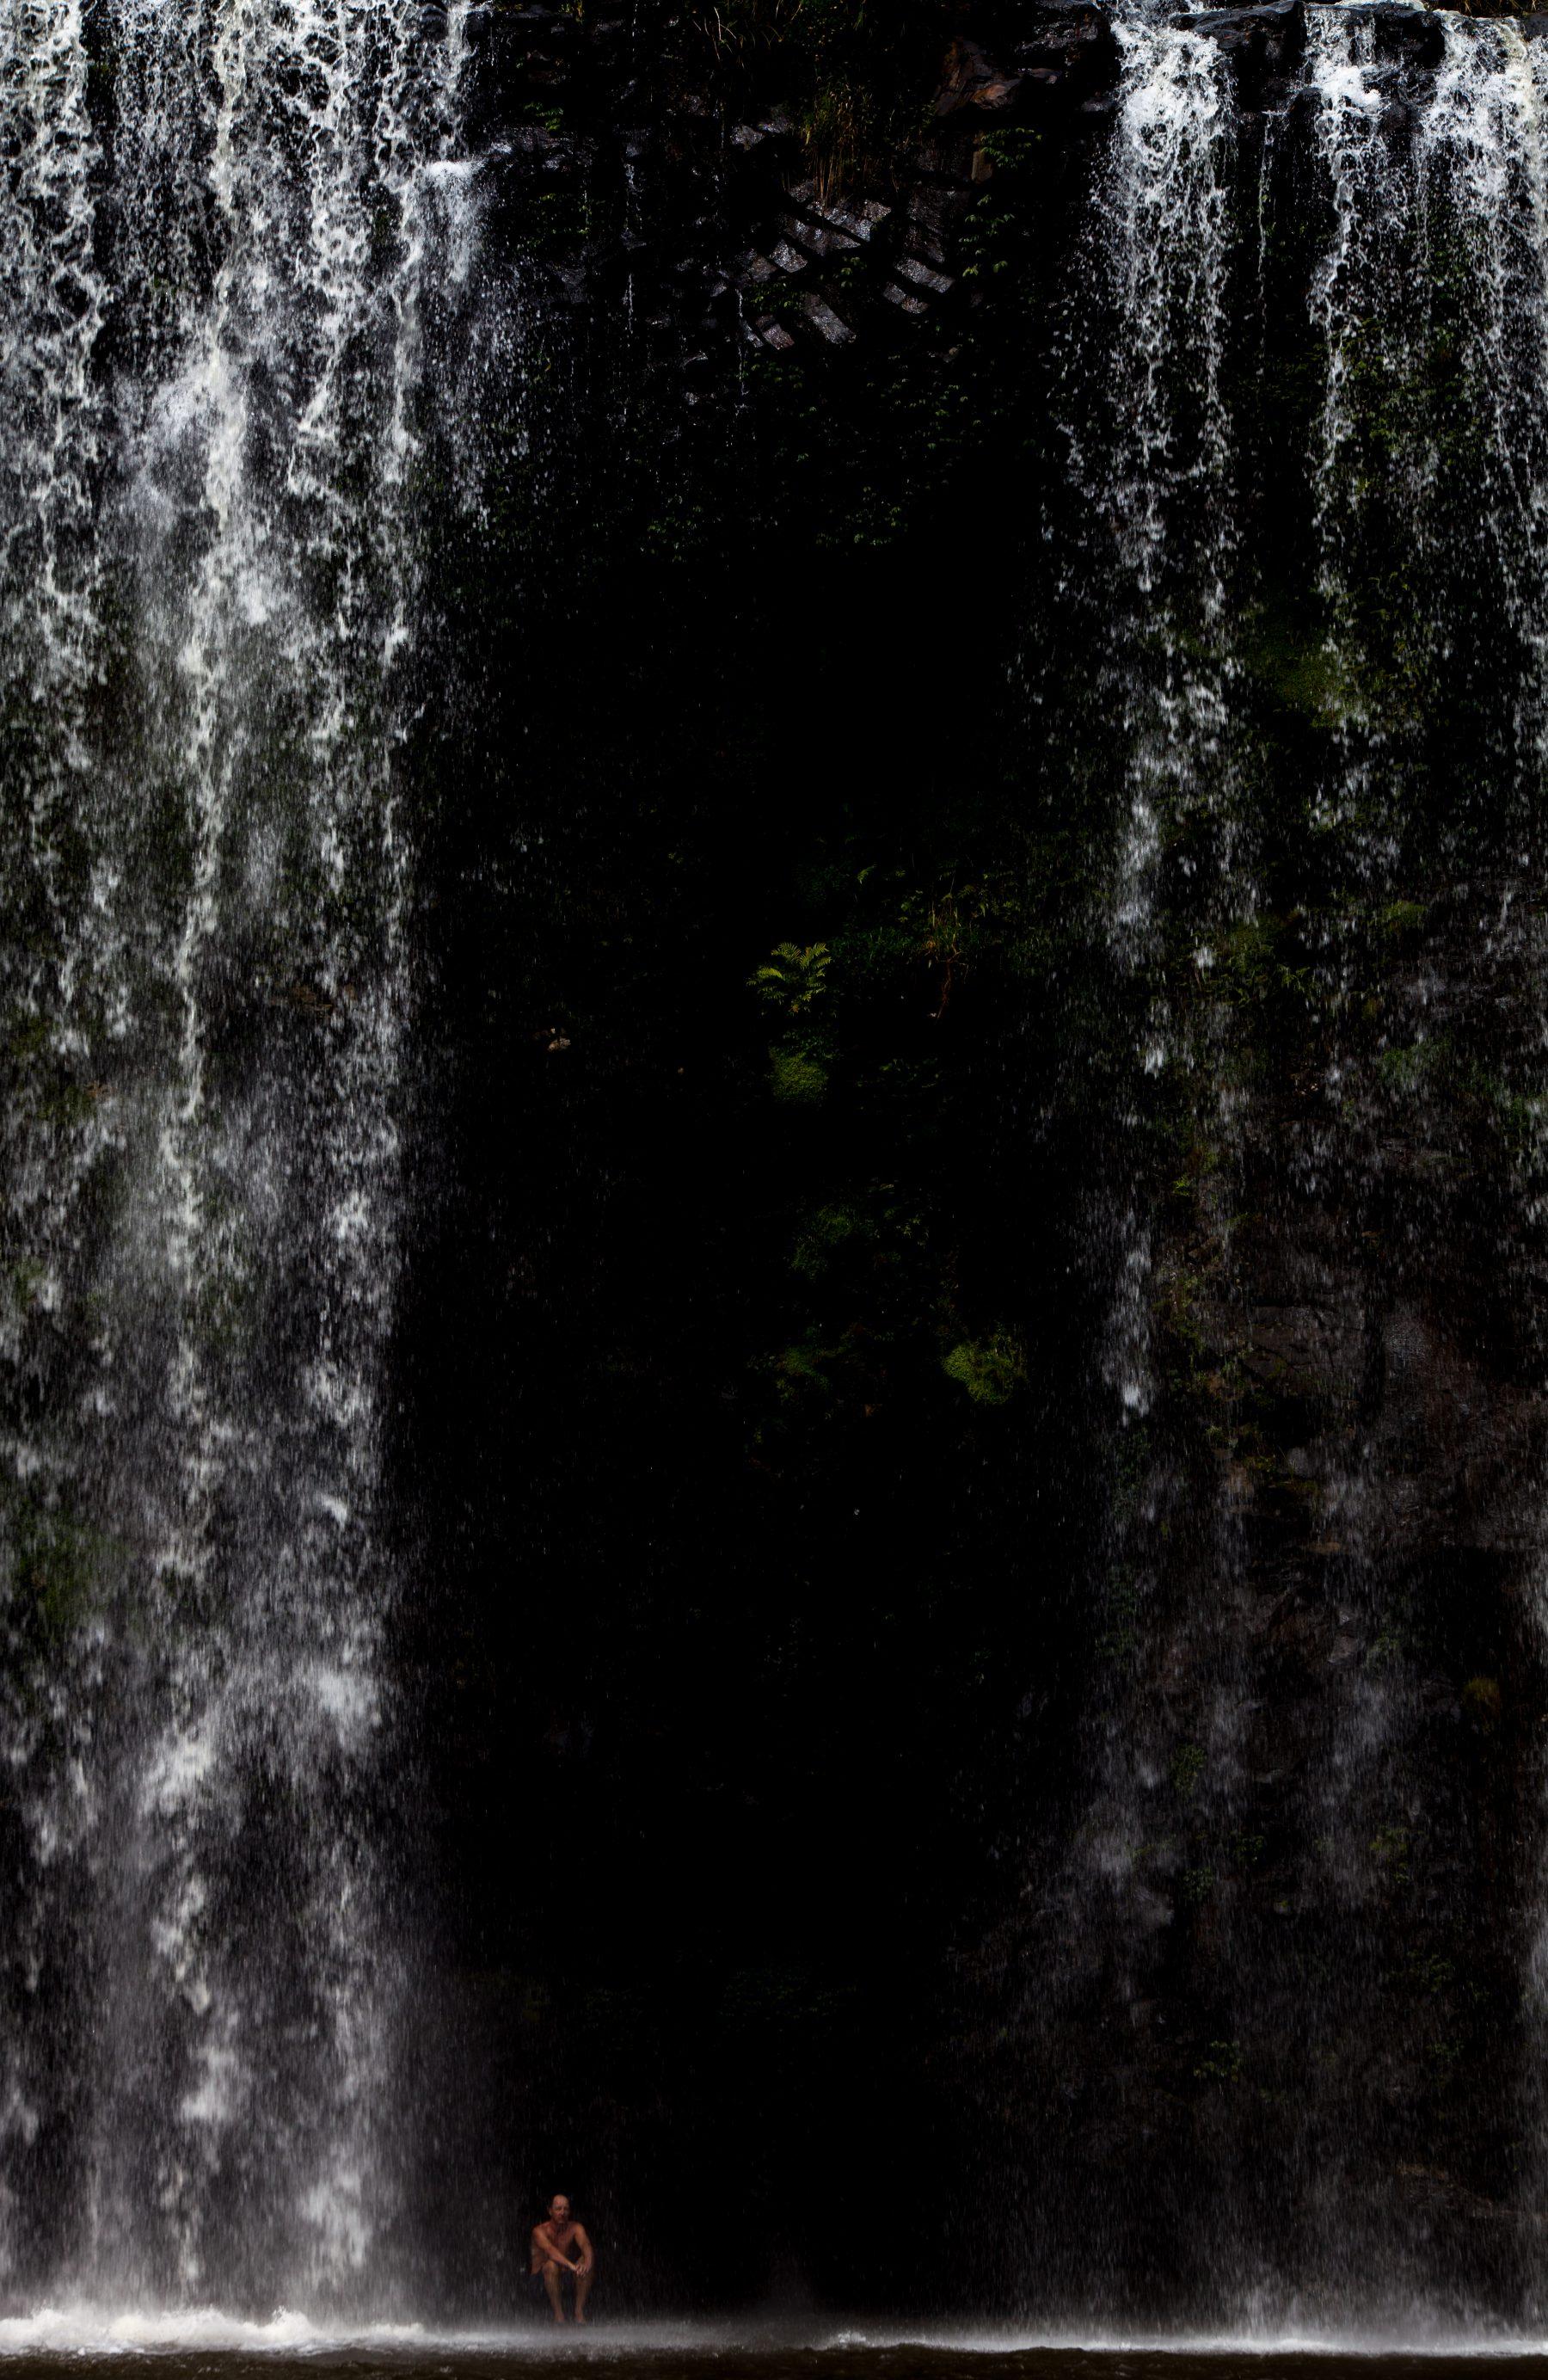 Nowhere & Everywhere Eco Travel Photography Dorrigo National Park New South Wales Road Trip Lis Dingjan